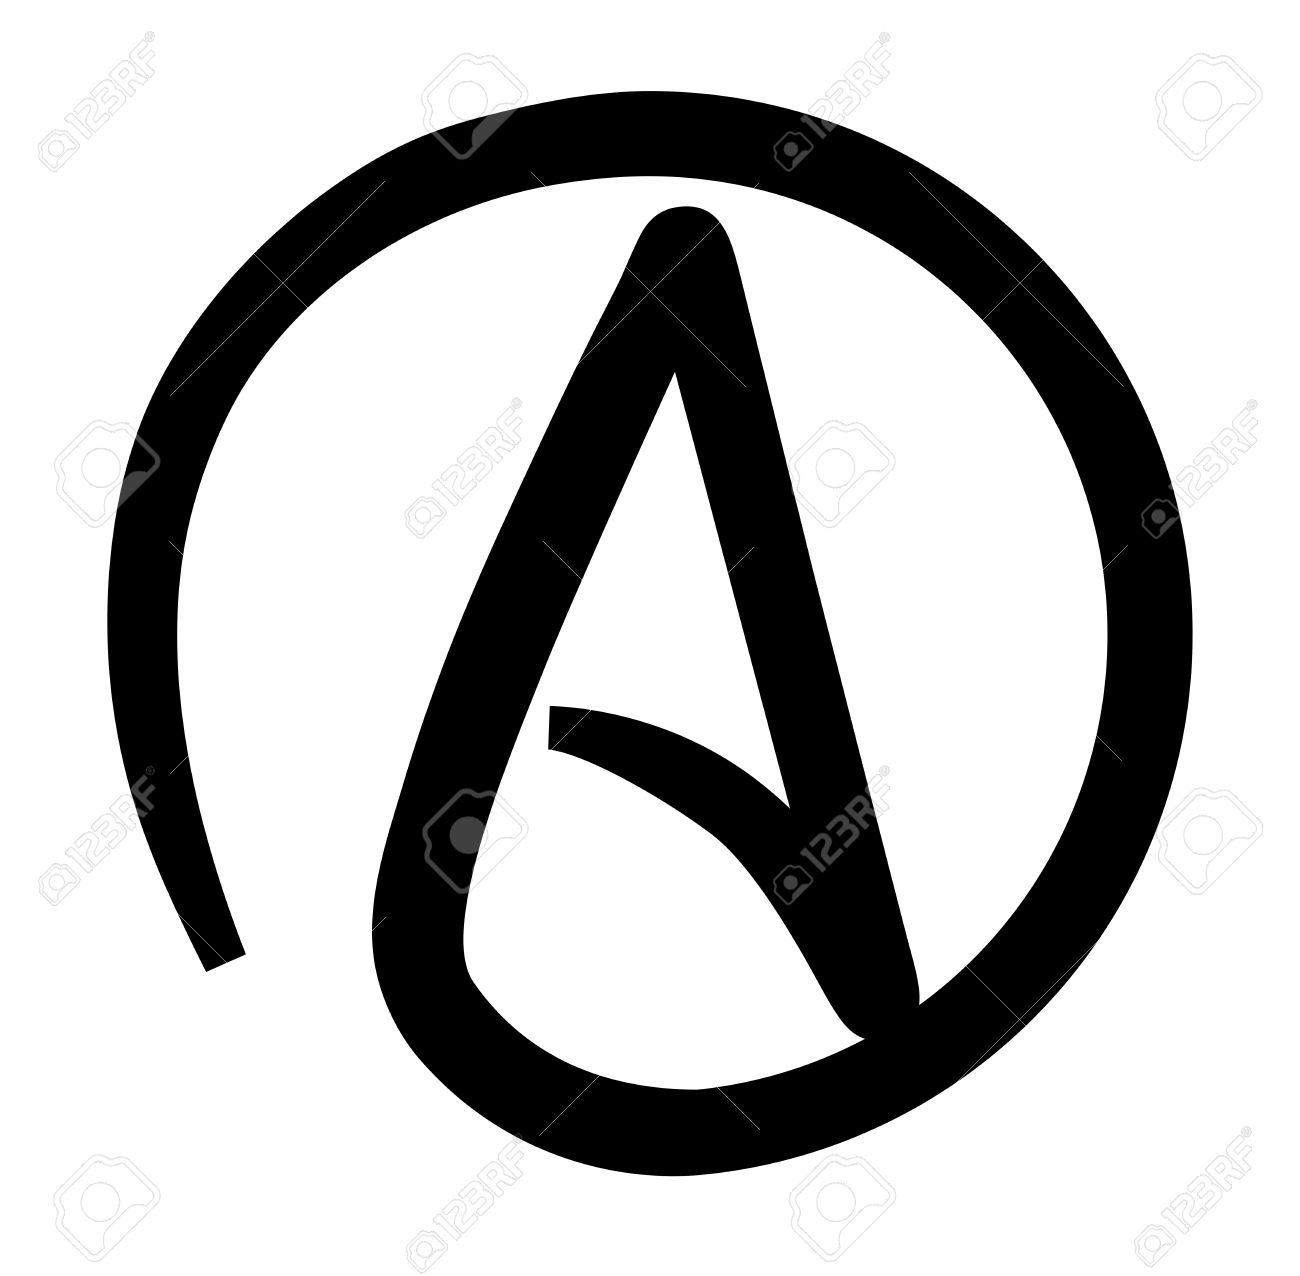 Atheism black and white printable symbol stock vector 38928813